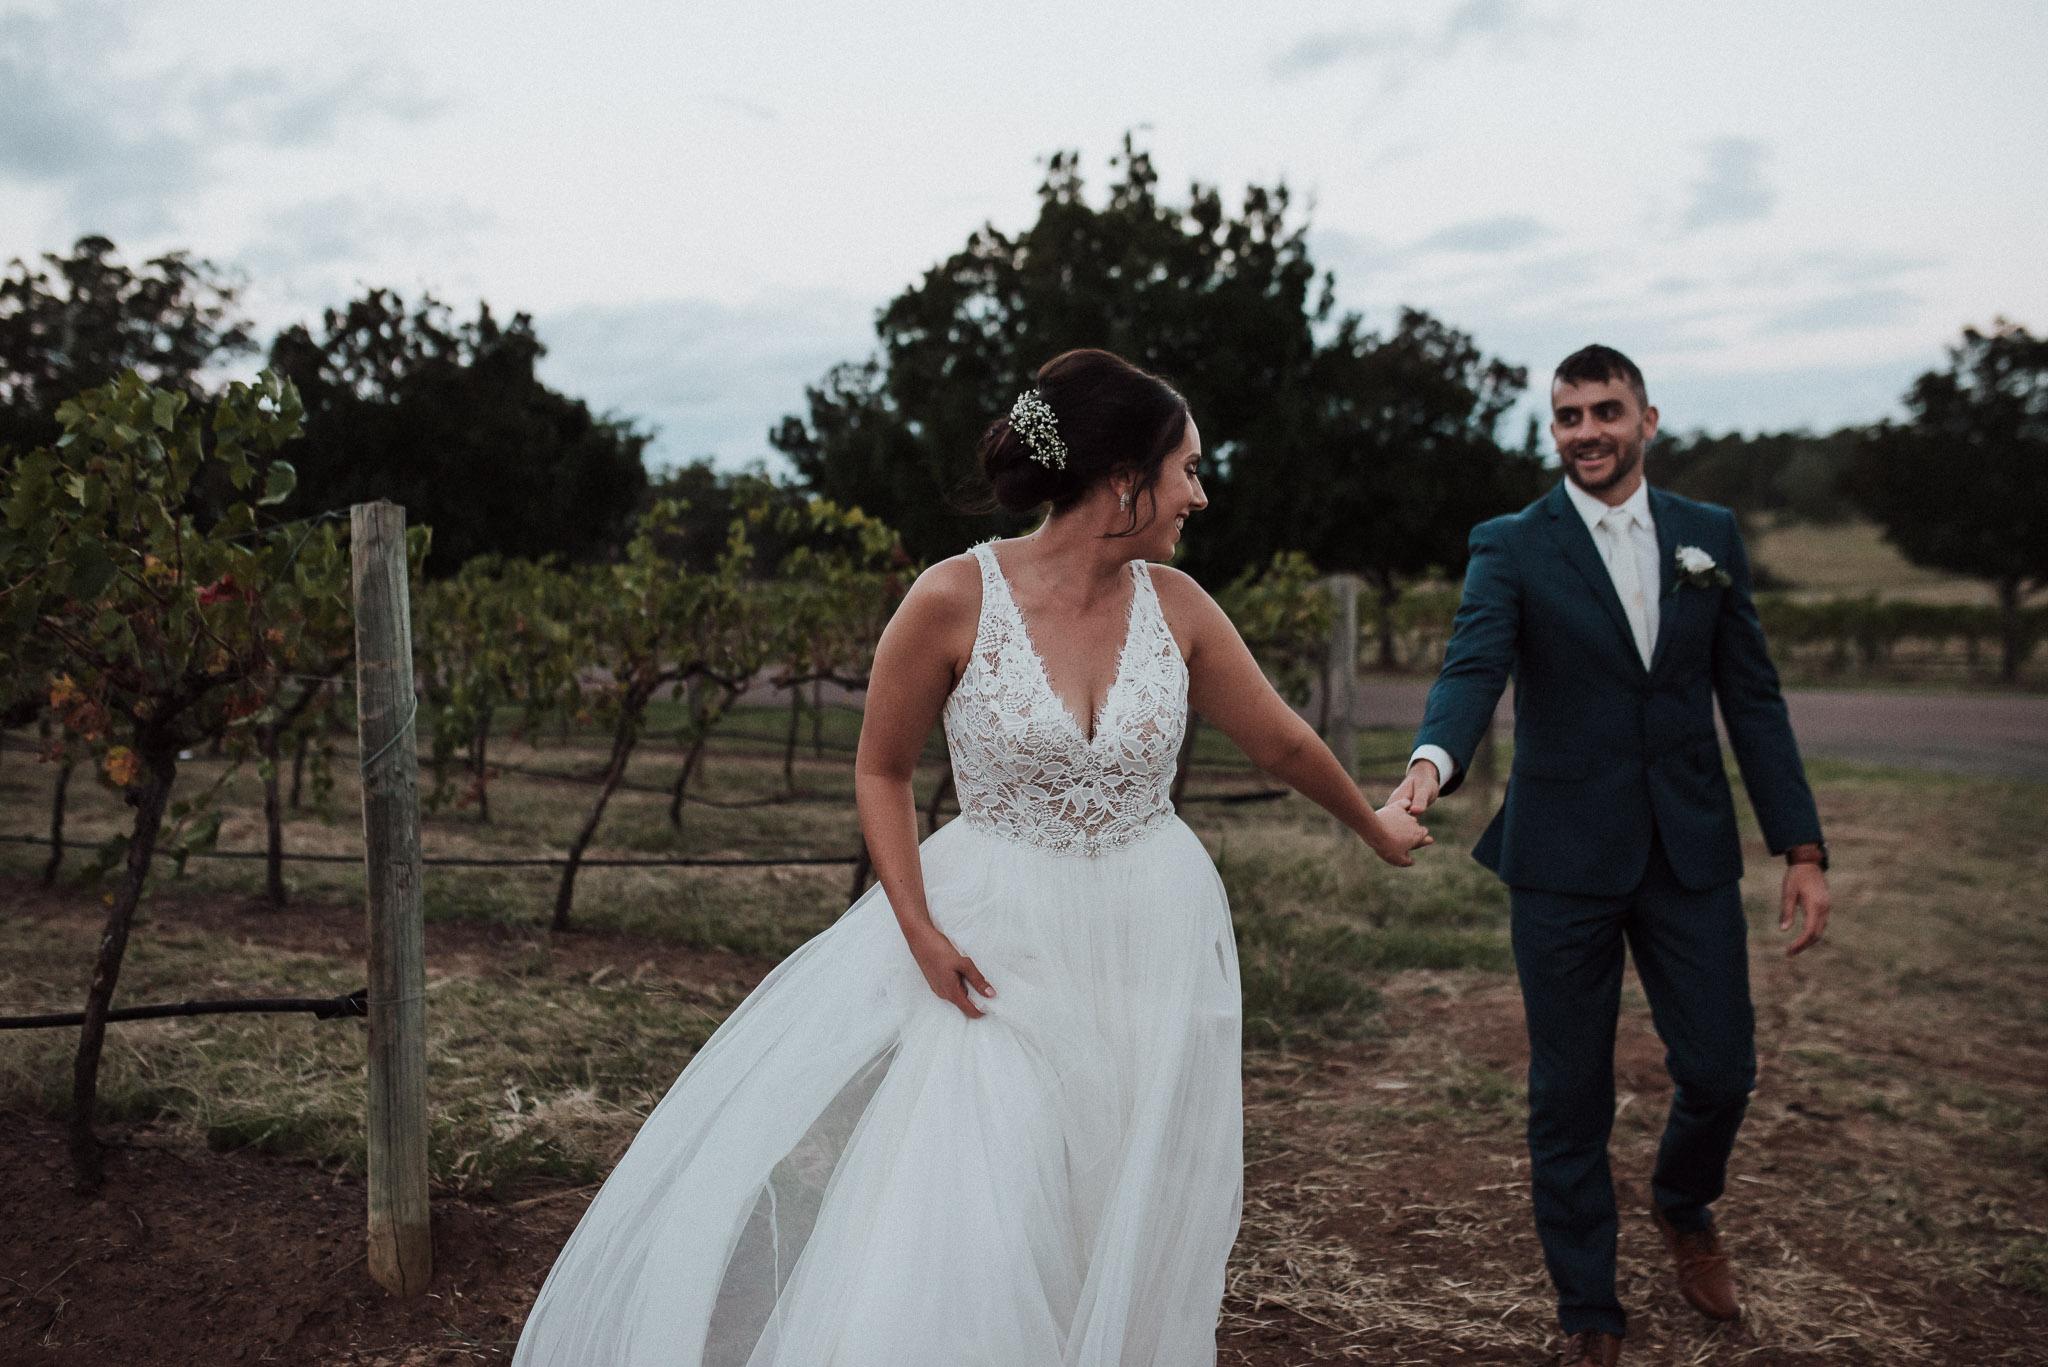 MECURE-RESORT-WEDDING-KING-WEB-509.jpg